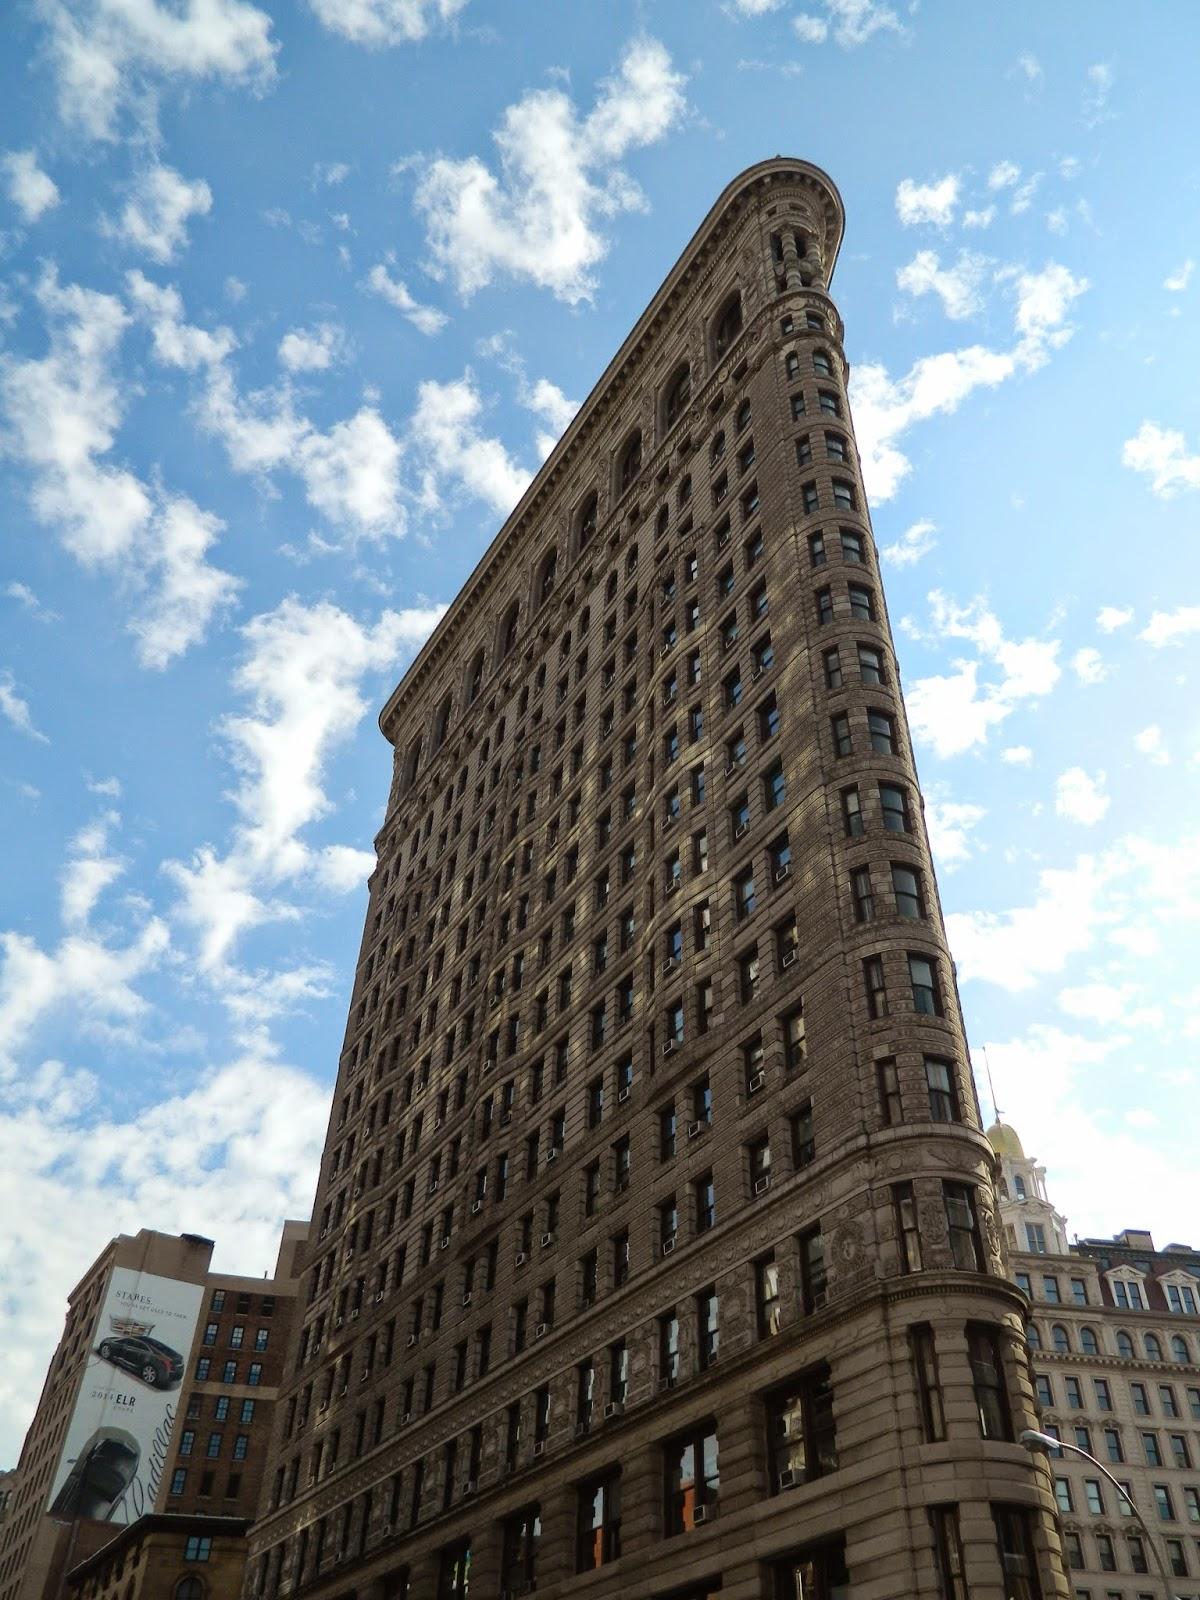 new york city flat iron sun sky reflection side view